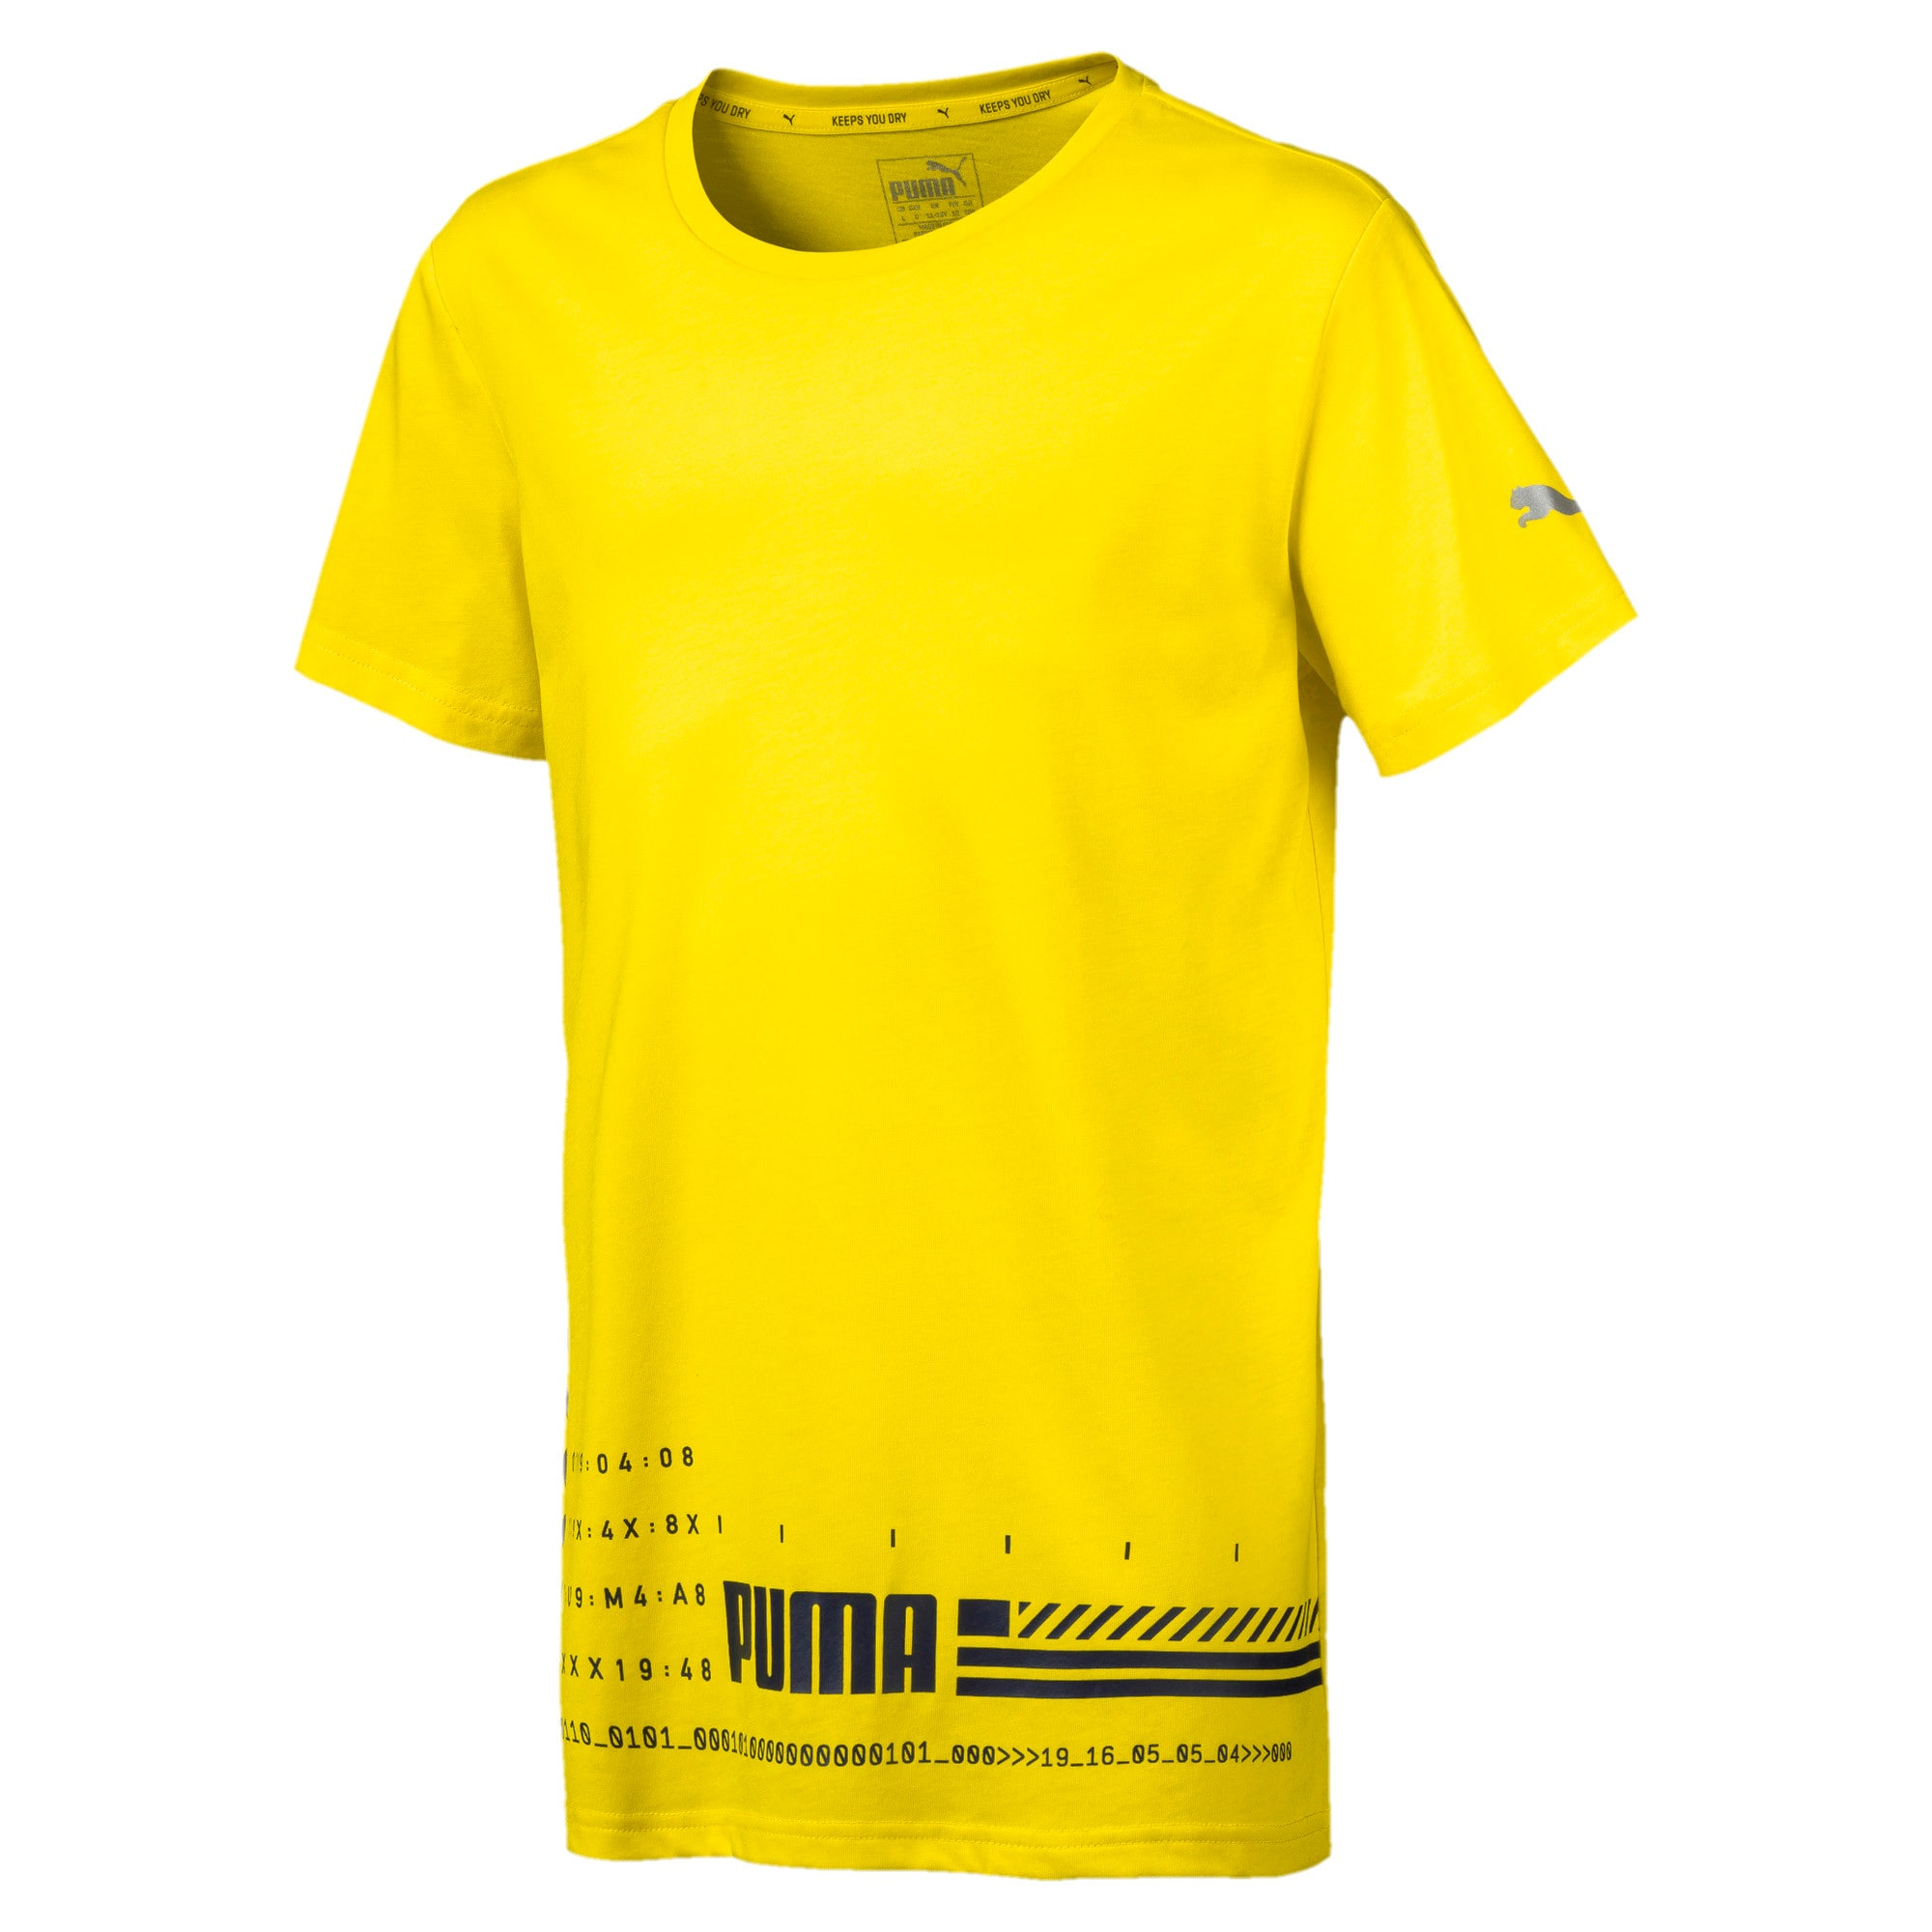 Thumbnail 2 of キッズ エナジー SS Tシャツ 半袖, Blazing Yellow, medium-JPN